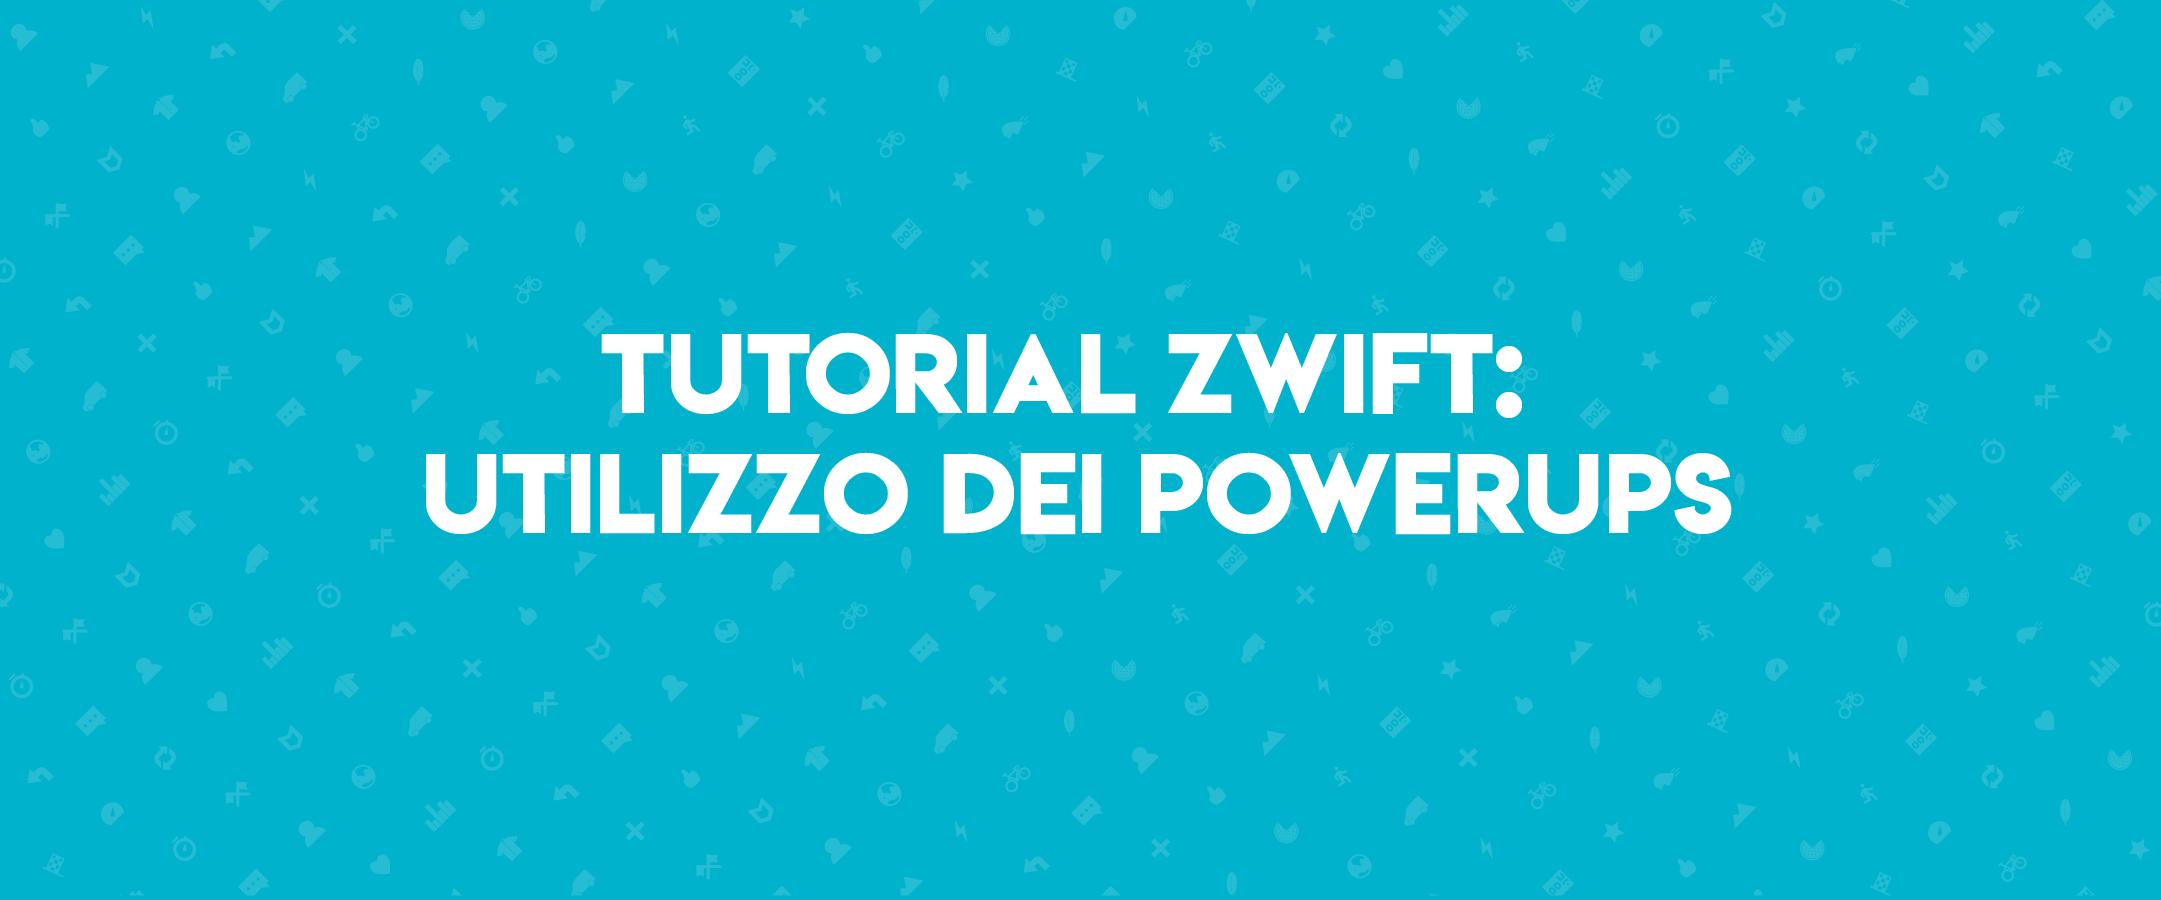 Tutorial Zwift utilizzo dei Powerups